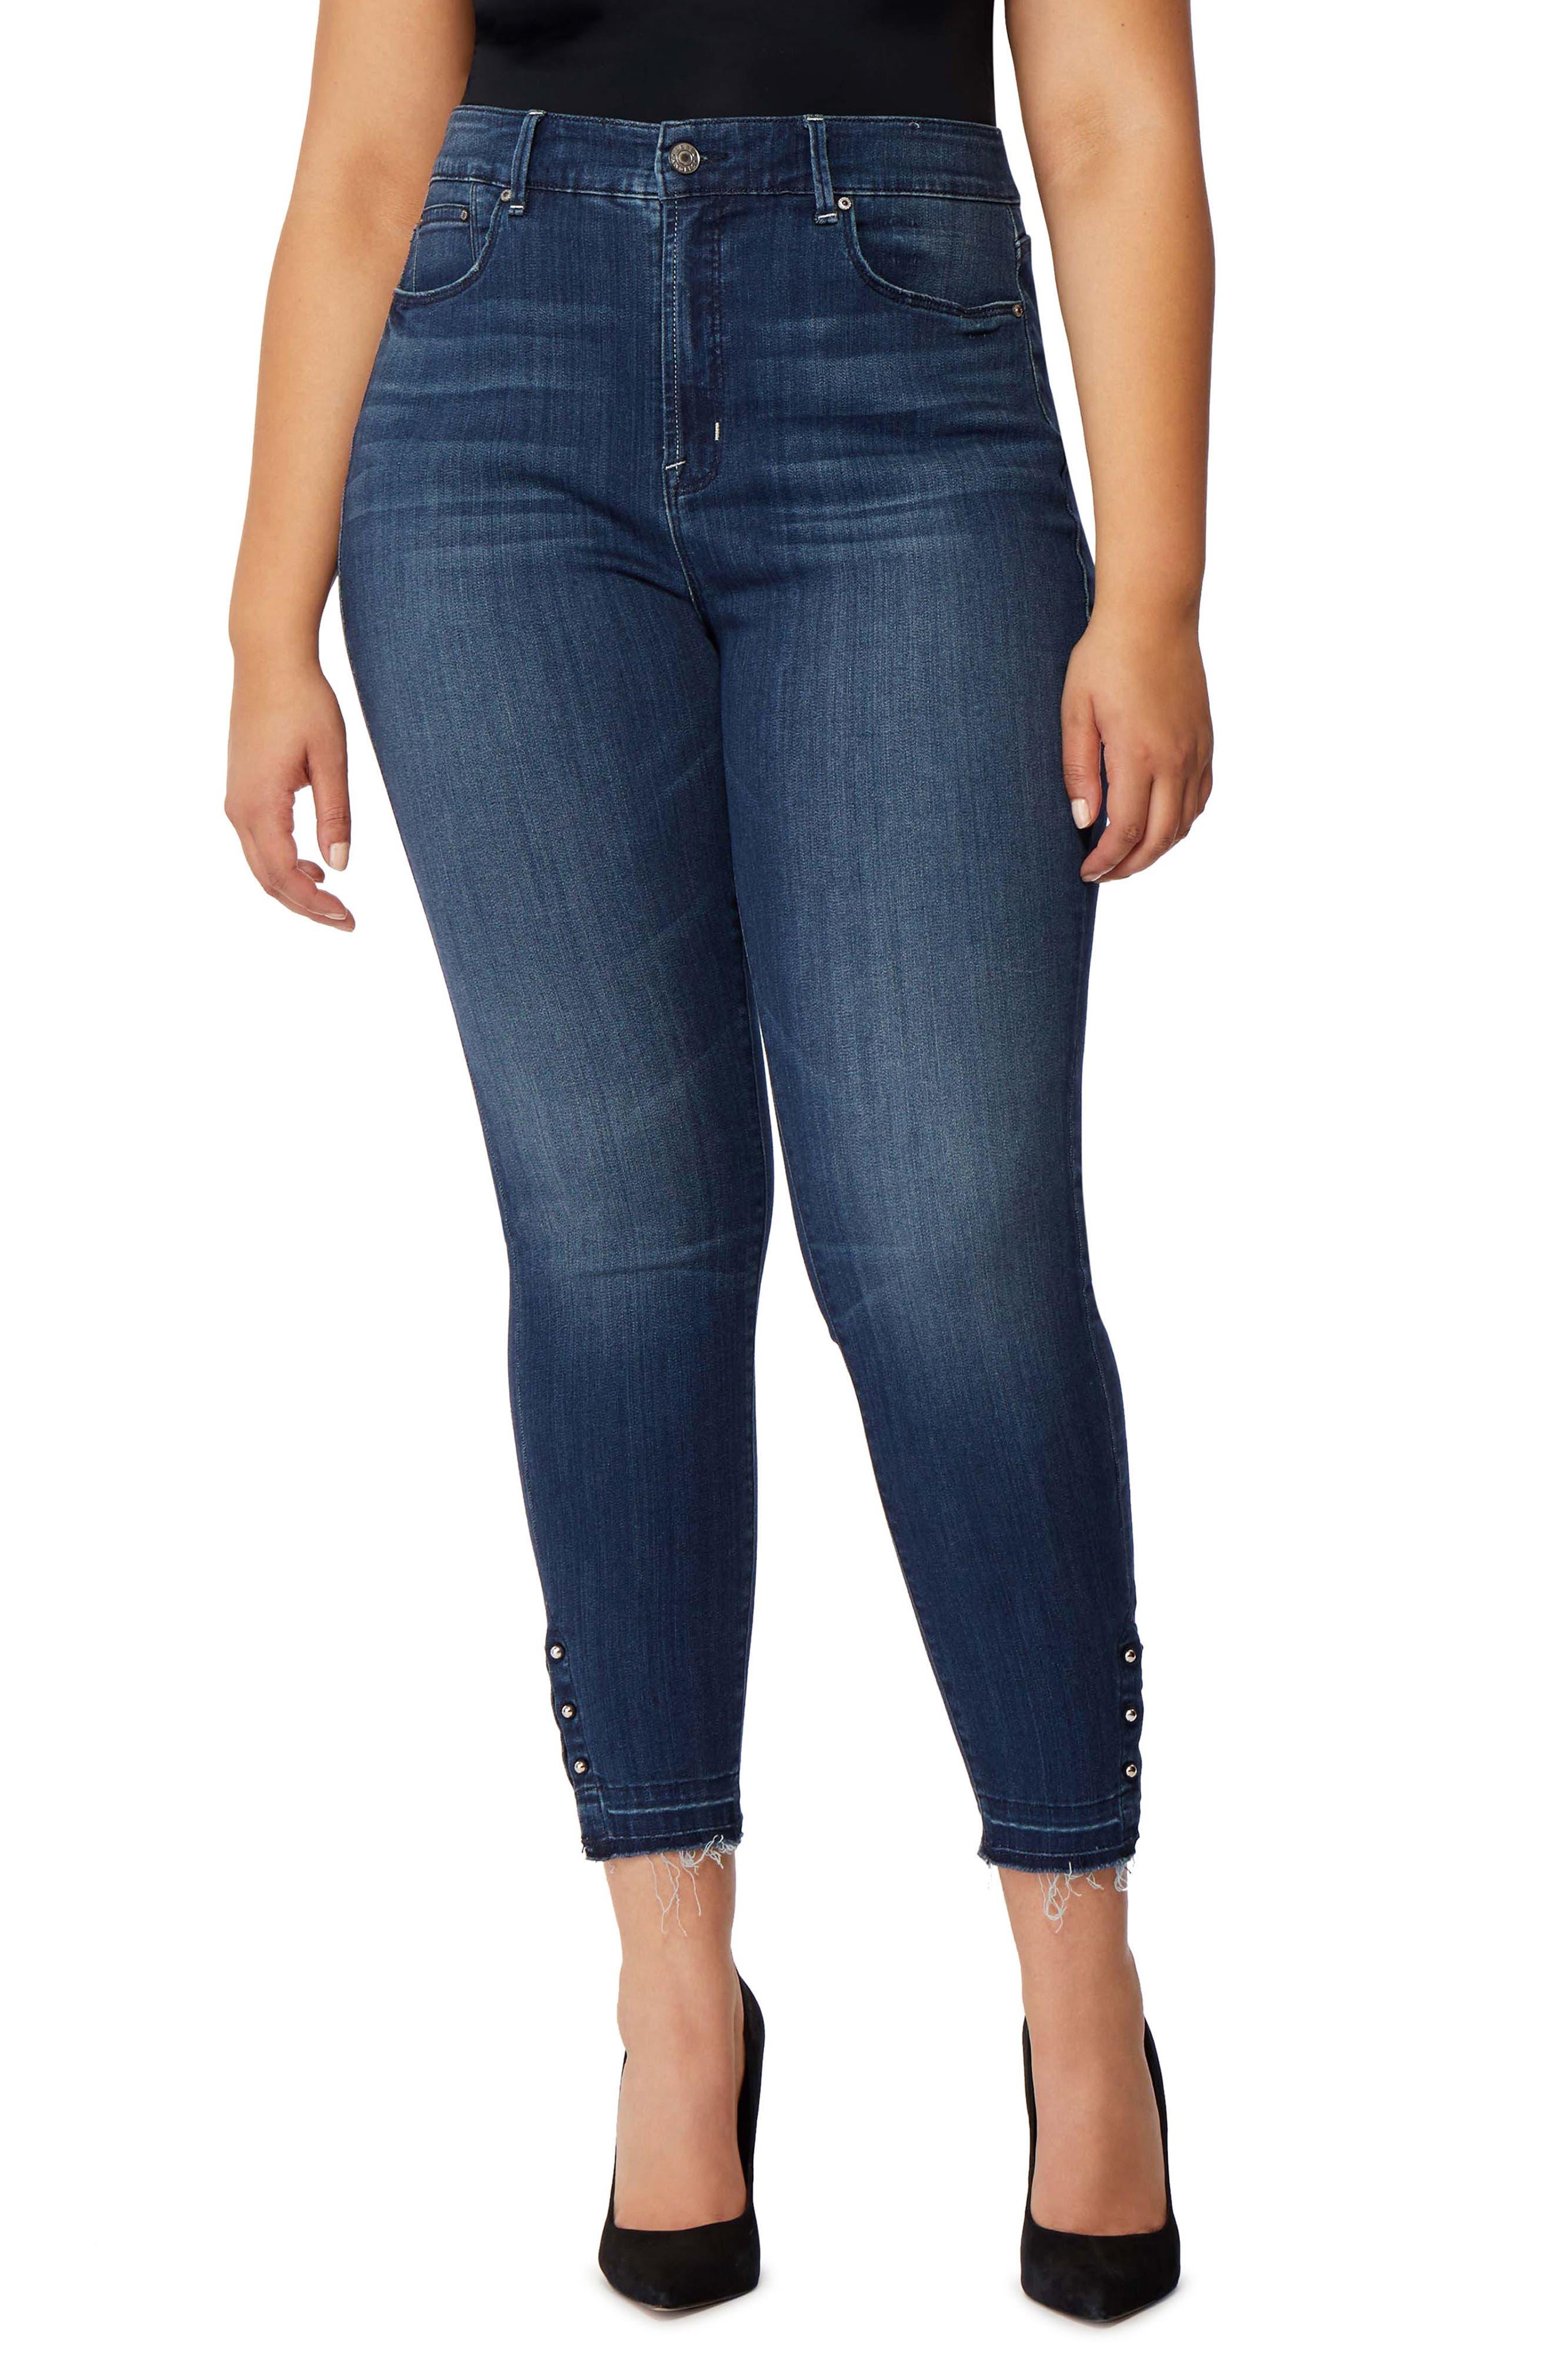 Rebel Wilson The Vamp Crop High Waist Skinny Jeans,                         Main,                         color, DEL MAR